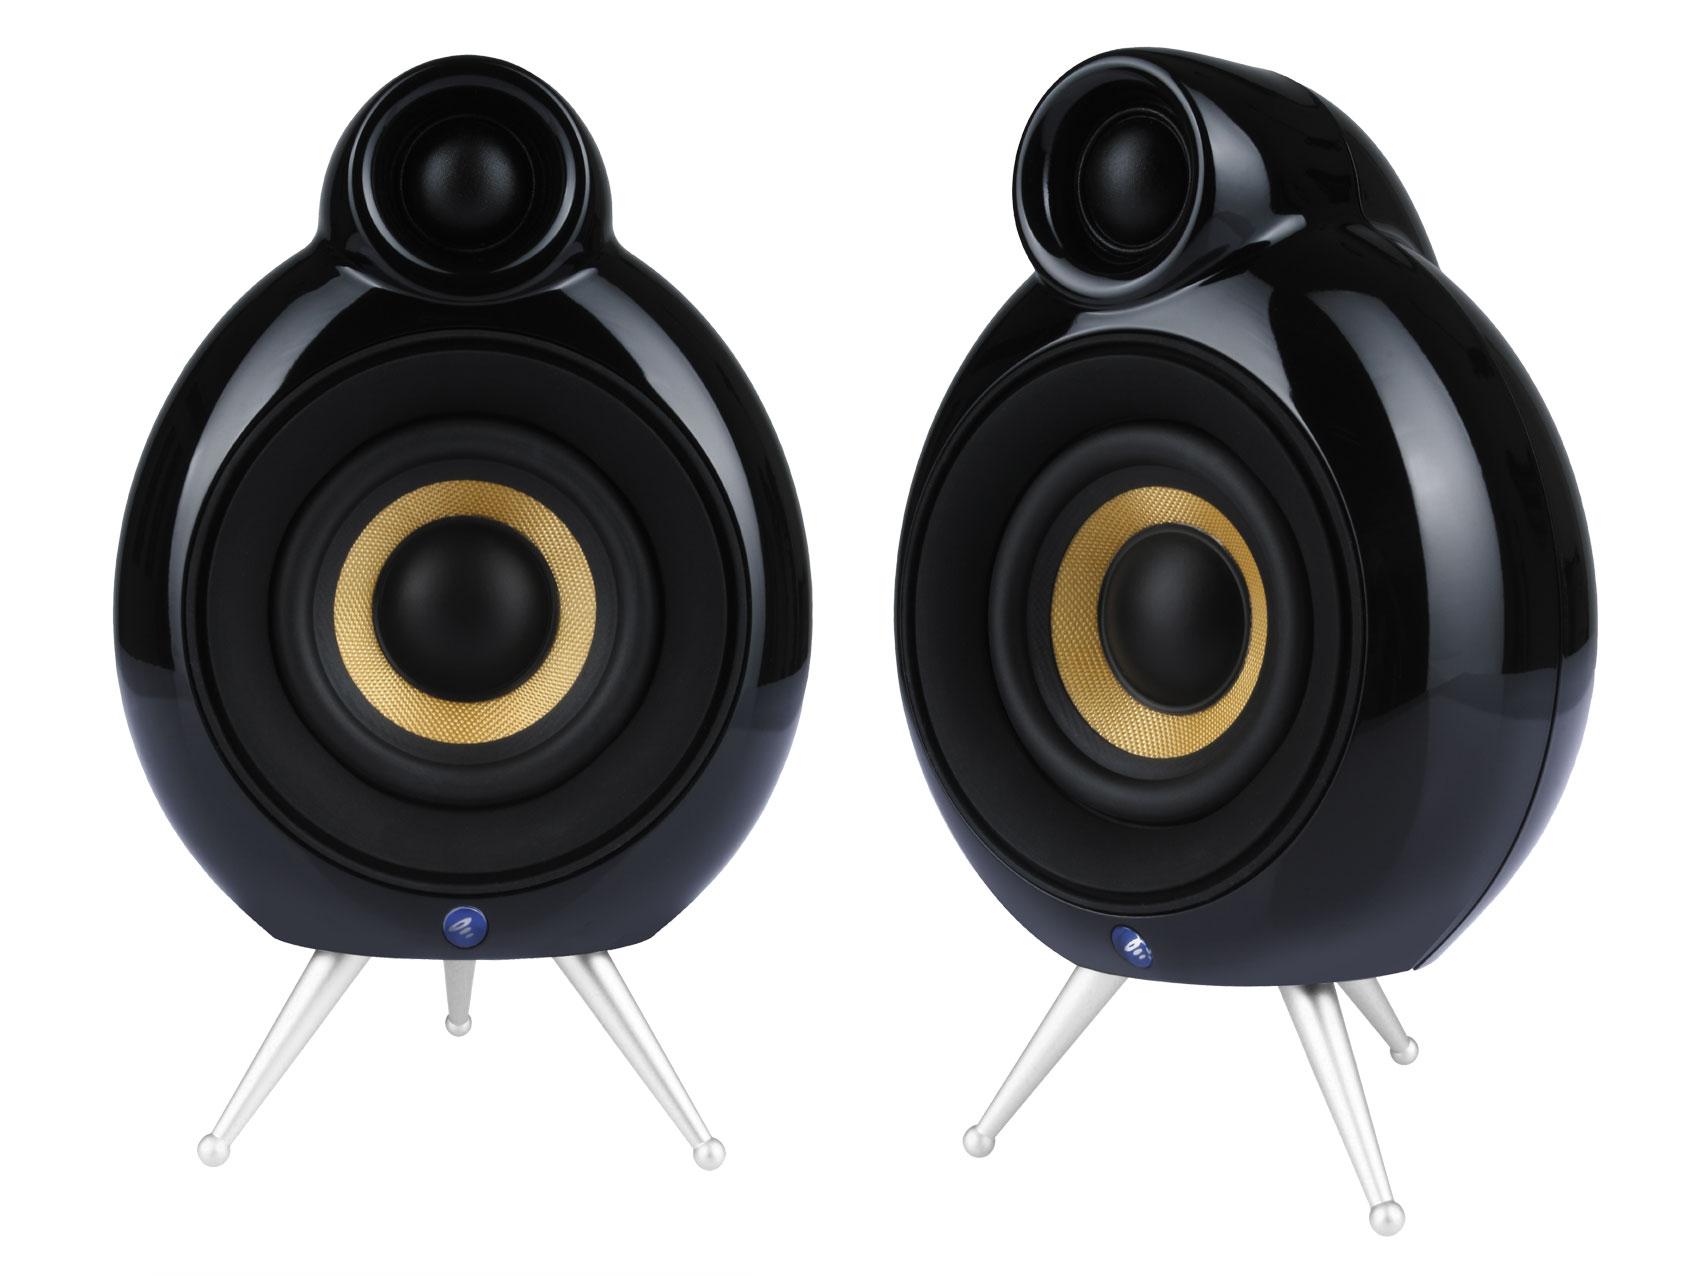 Listenup Podspeakers Micropod Se Black Compact Speaker Single Audioengine Hd6 Cherry 1